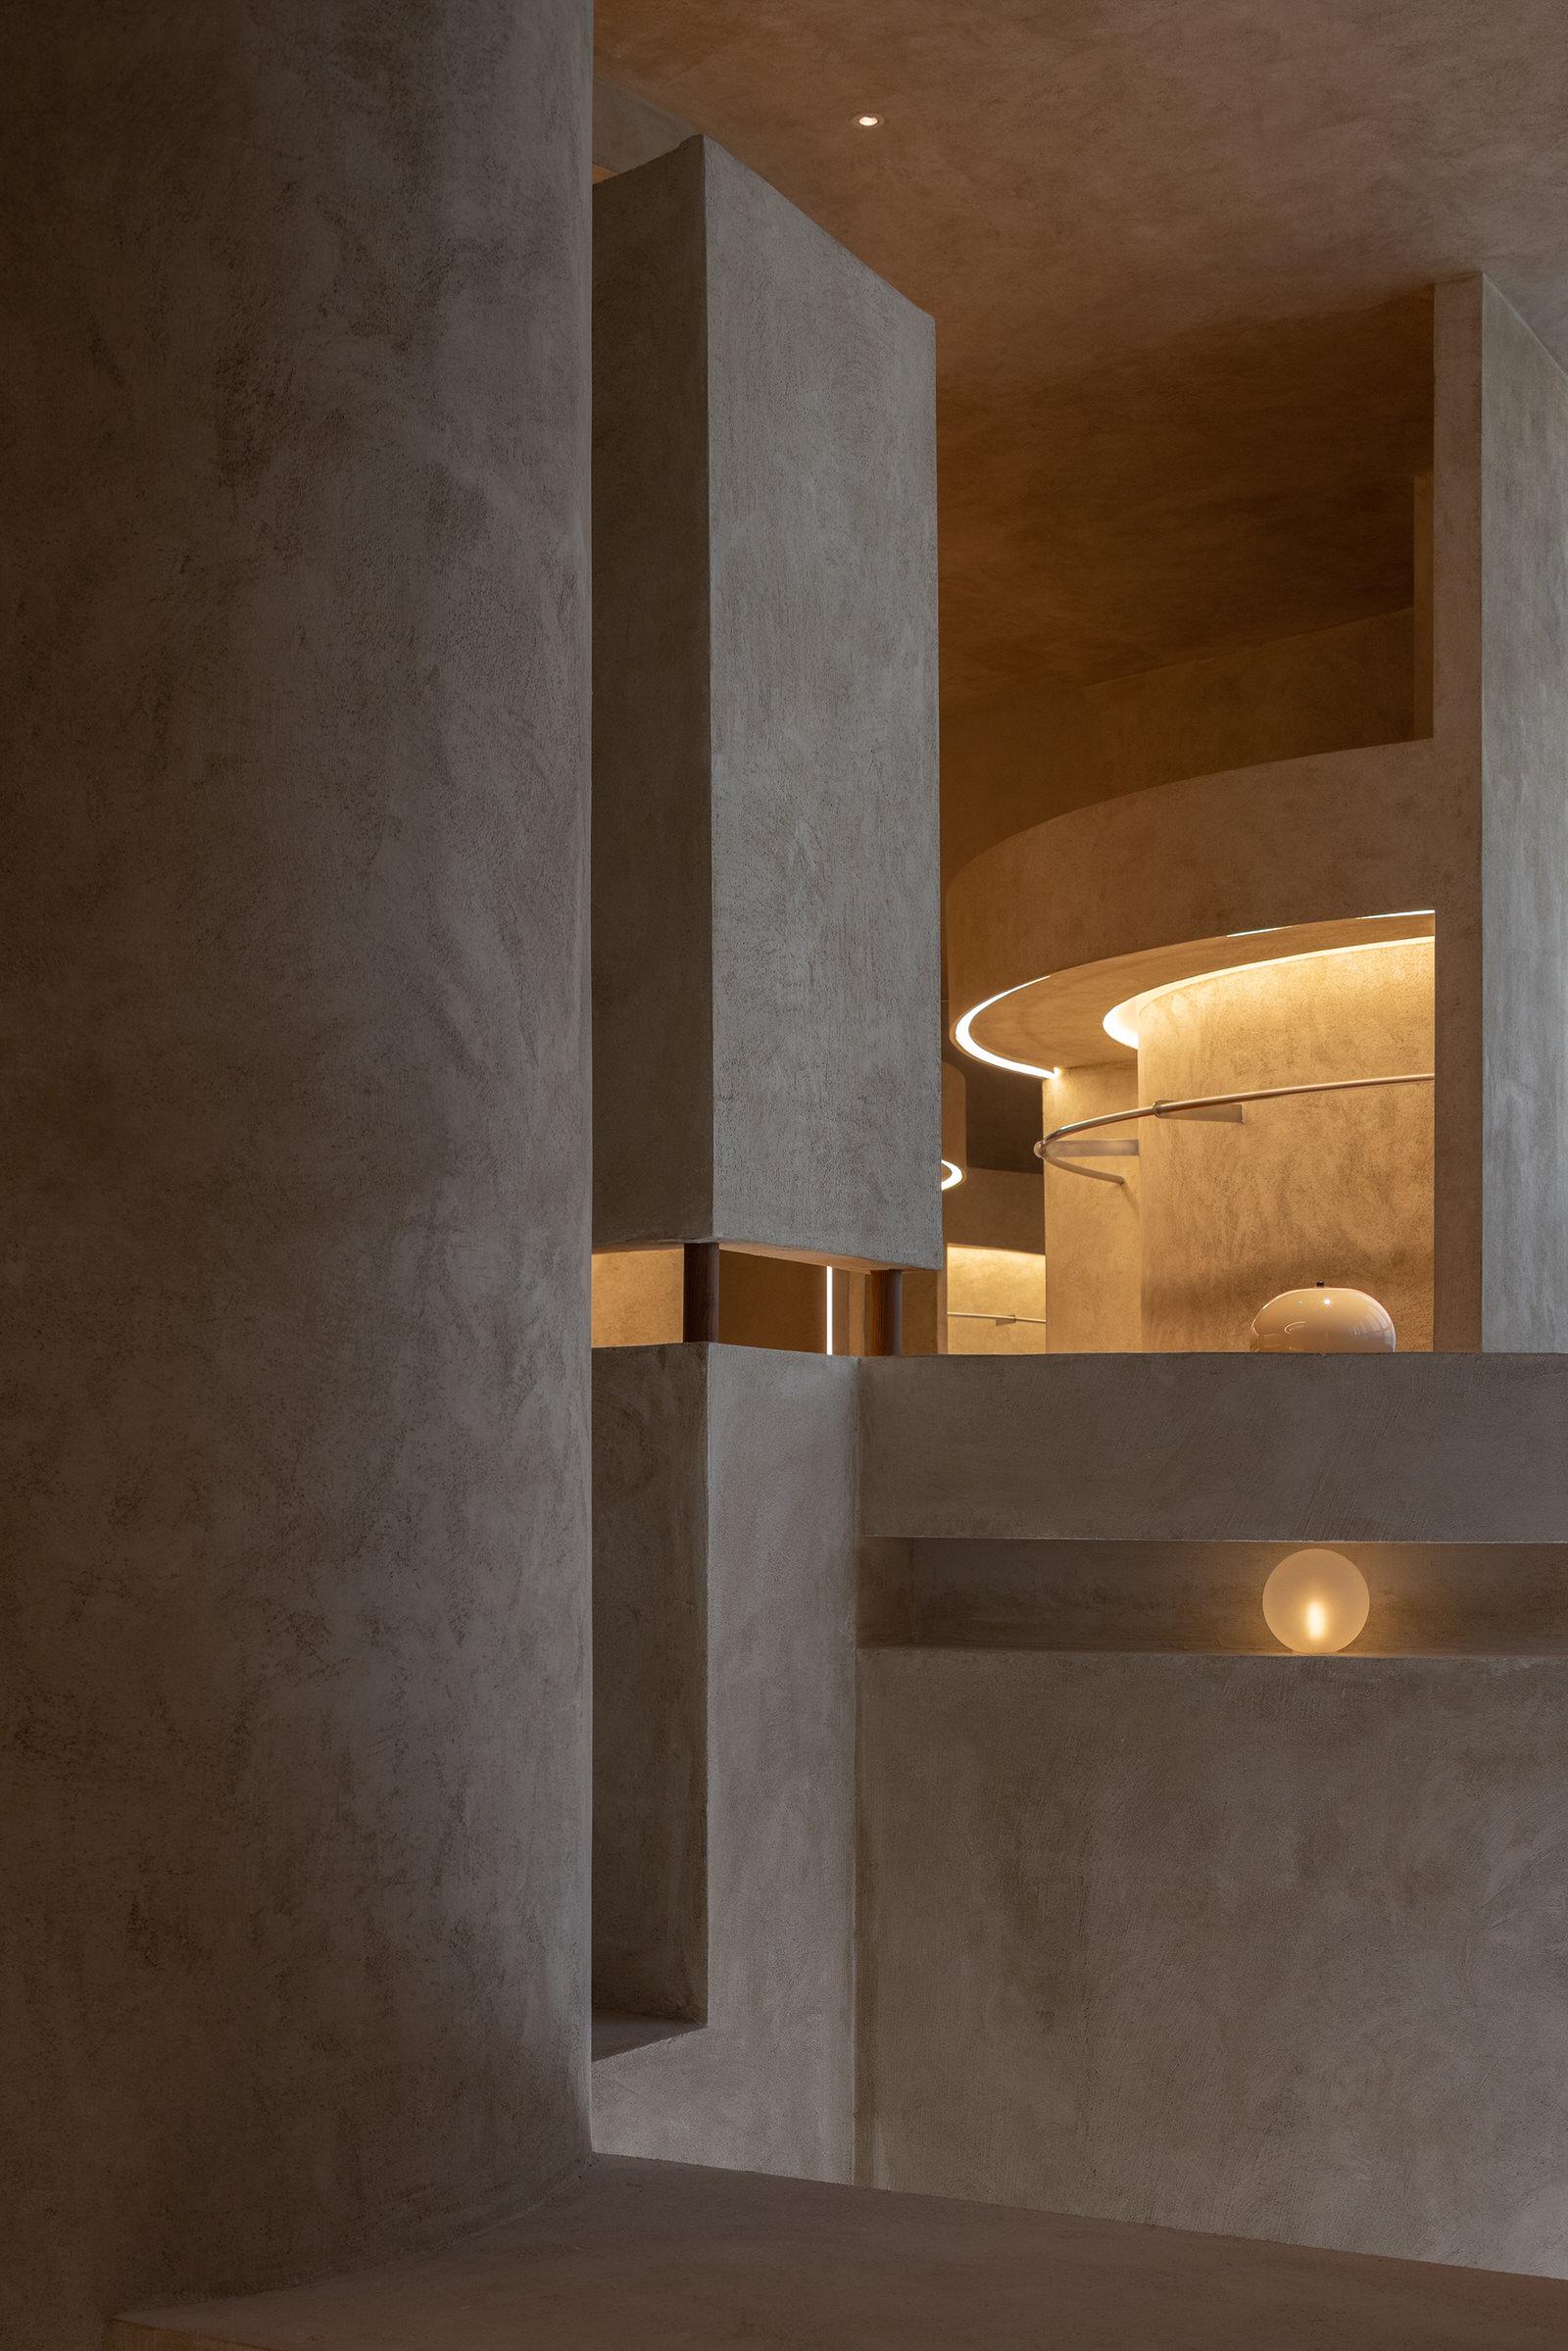 Liang Architecture Studio Audrey Boutique Hangzhou China Luxury Retail Photo Shao Feng Yellowtrace 22